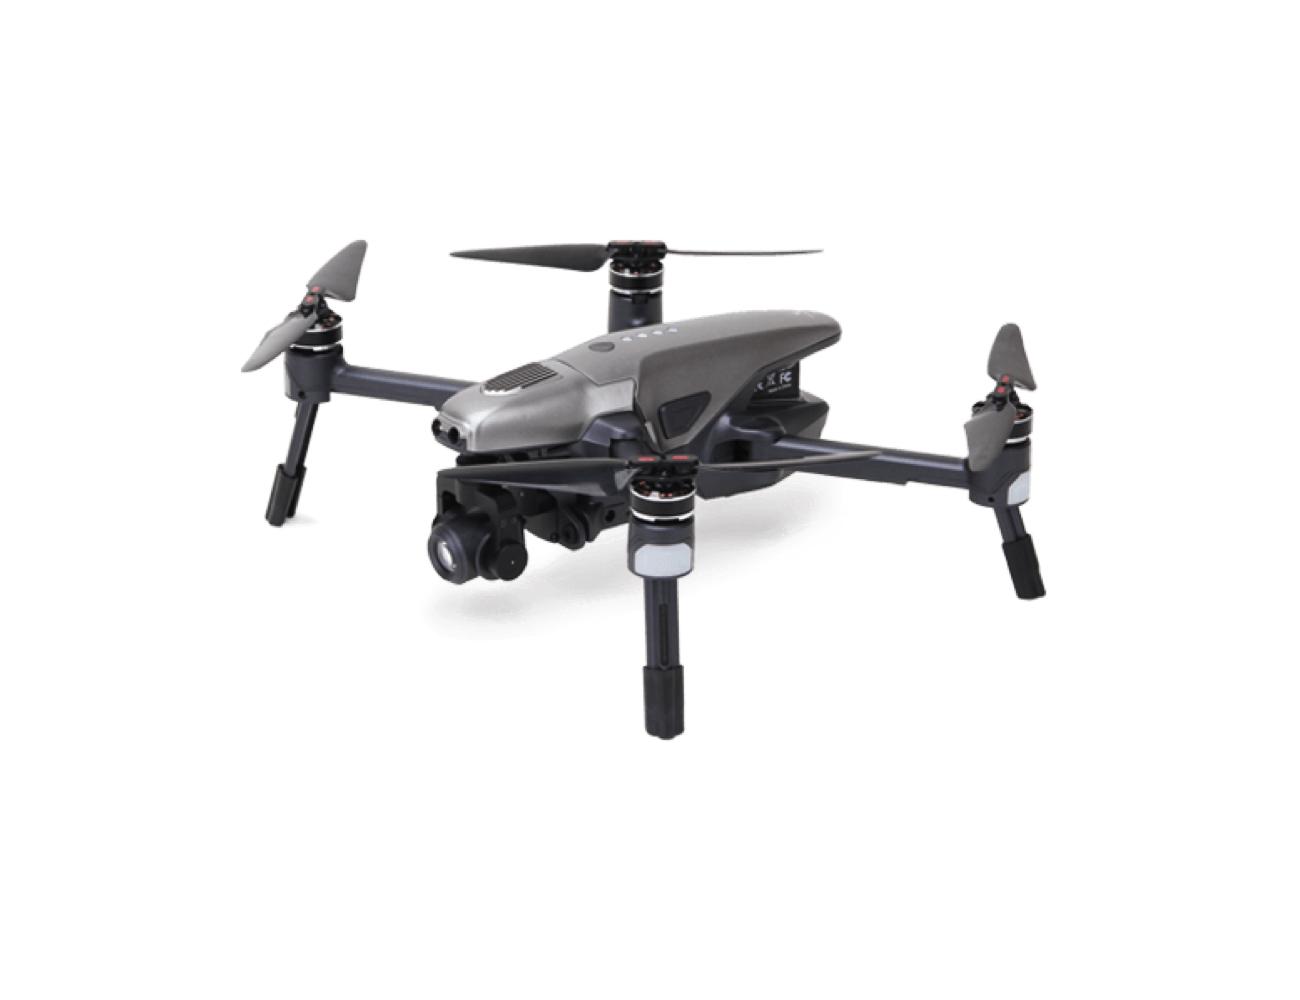 Walkera Vitus Intelligent Camera Drone